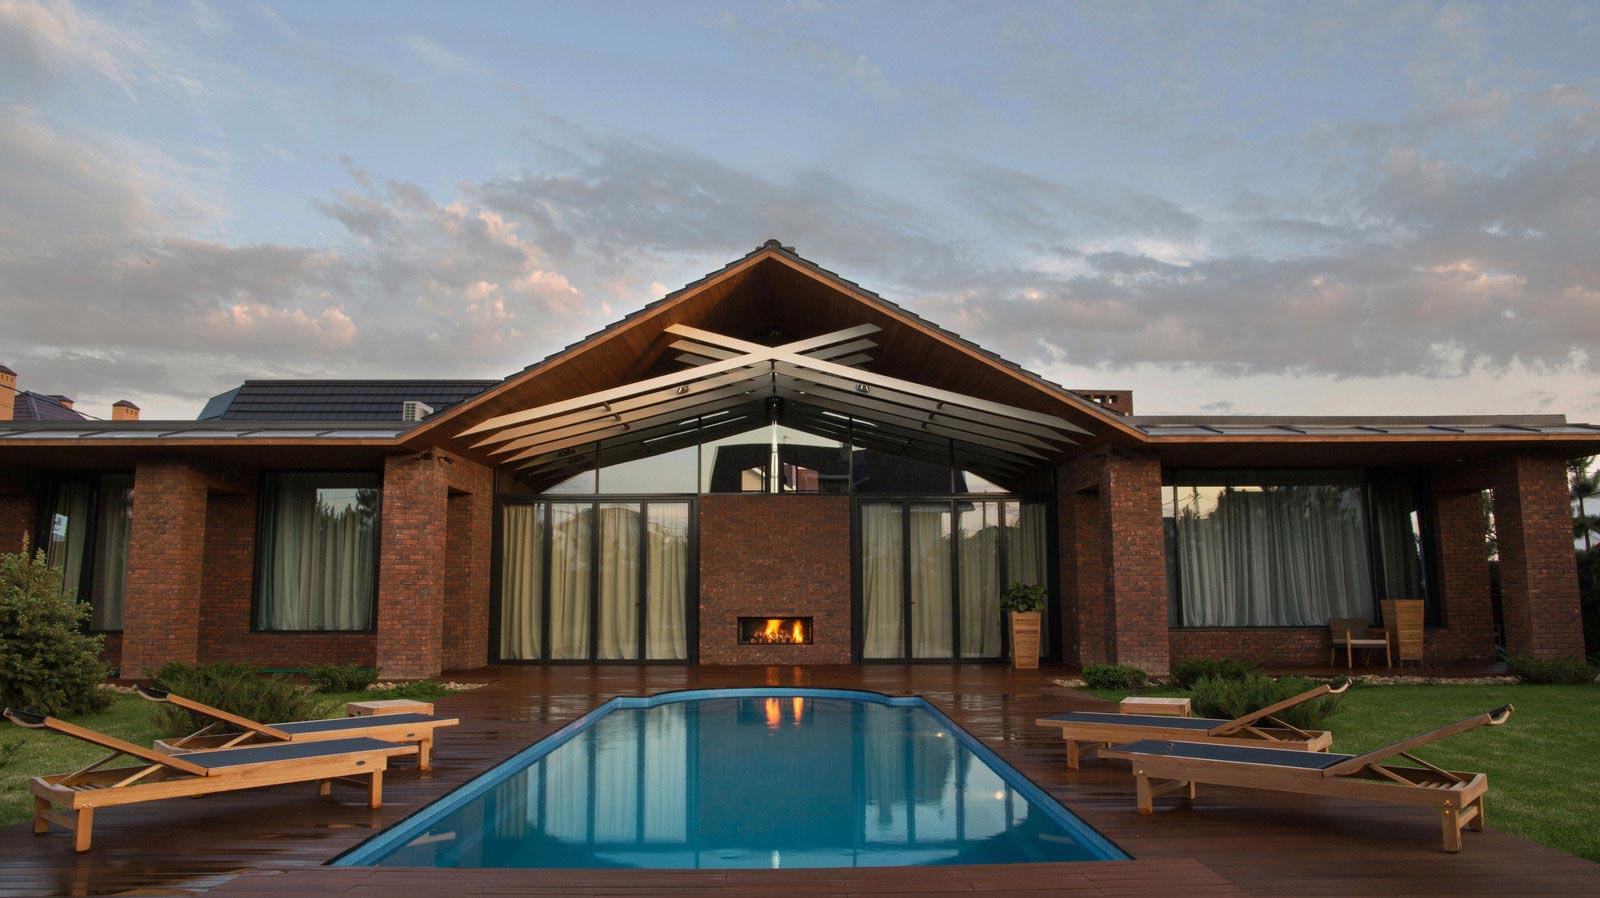 Casa de un piso de 390 metros cuadrados construye hogar for Casas de madera con piscina